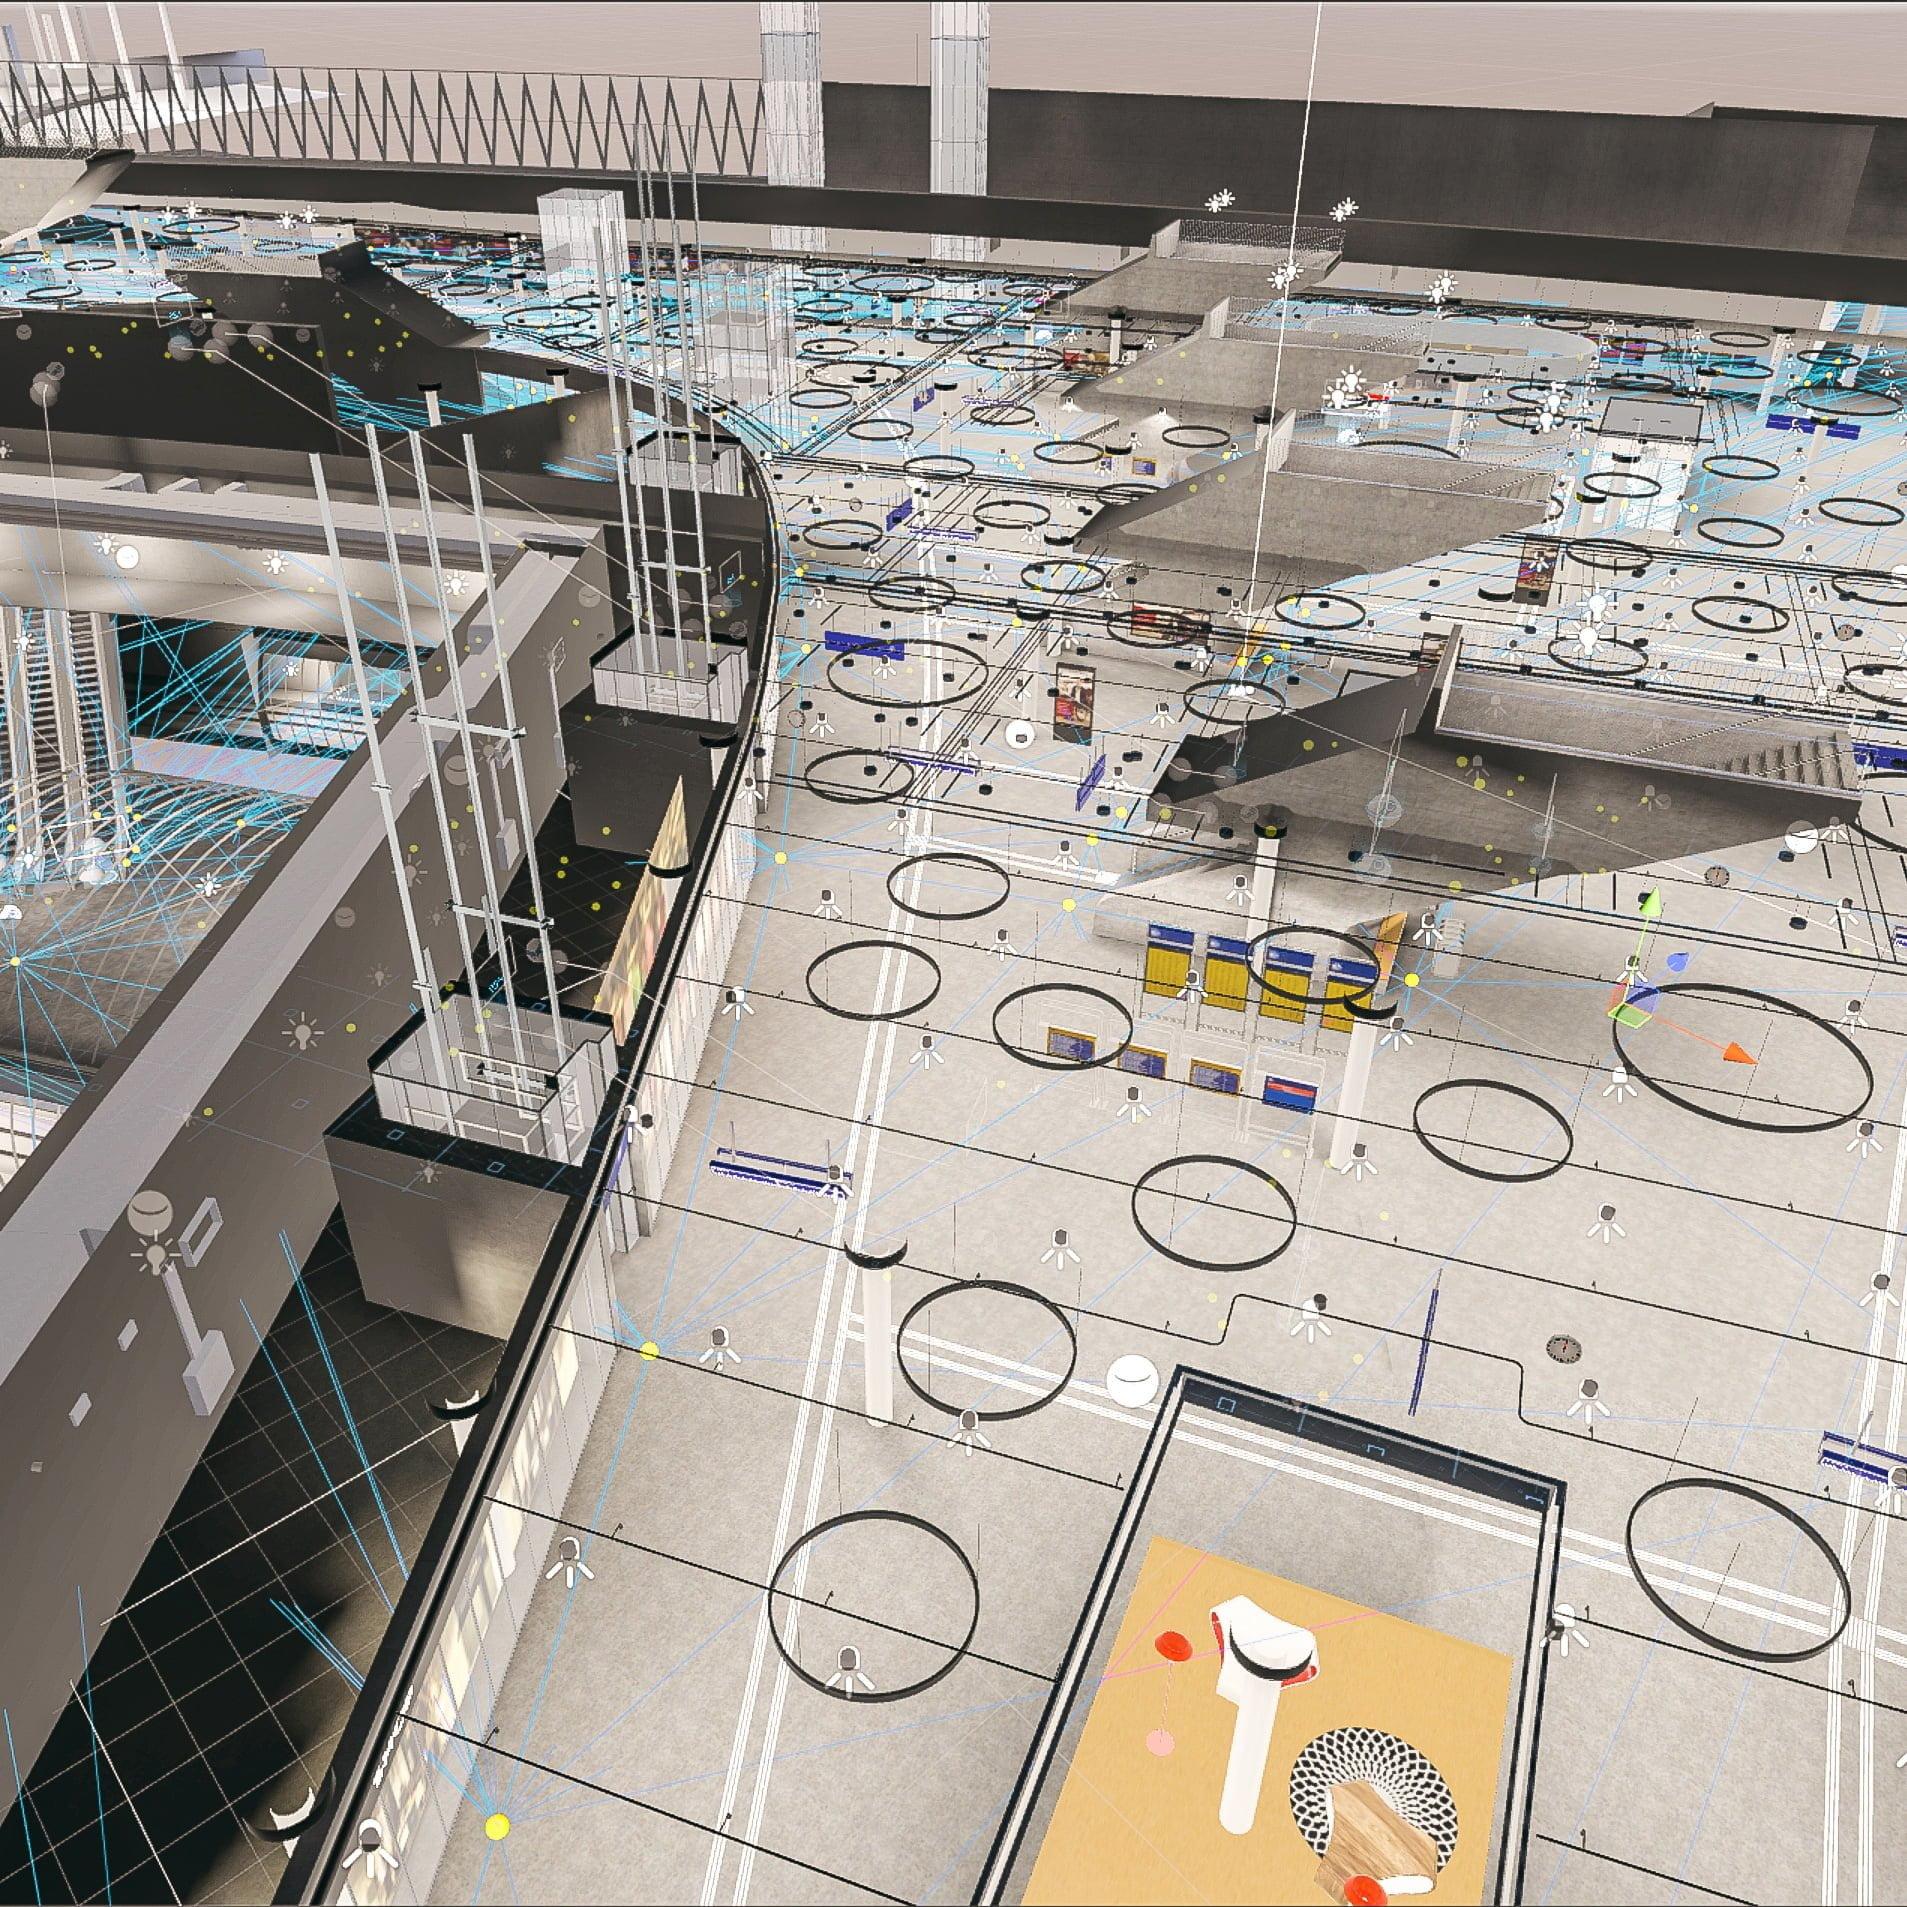 SBB, Bahnhof Bern, VR, Zoom, ikonaut